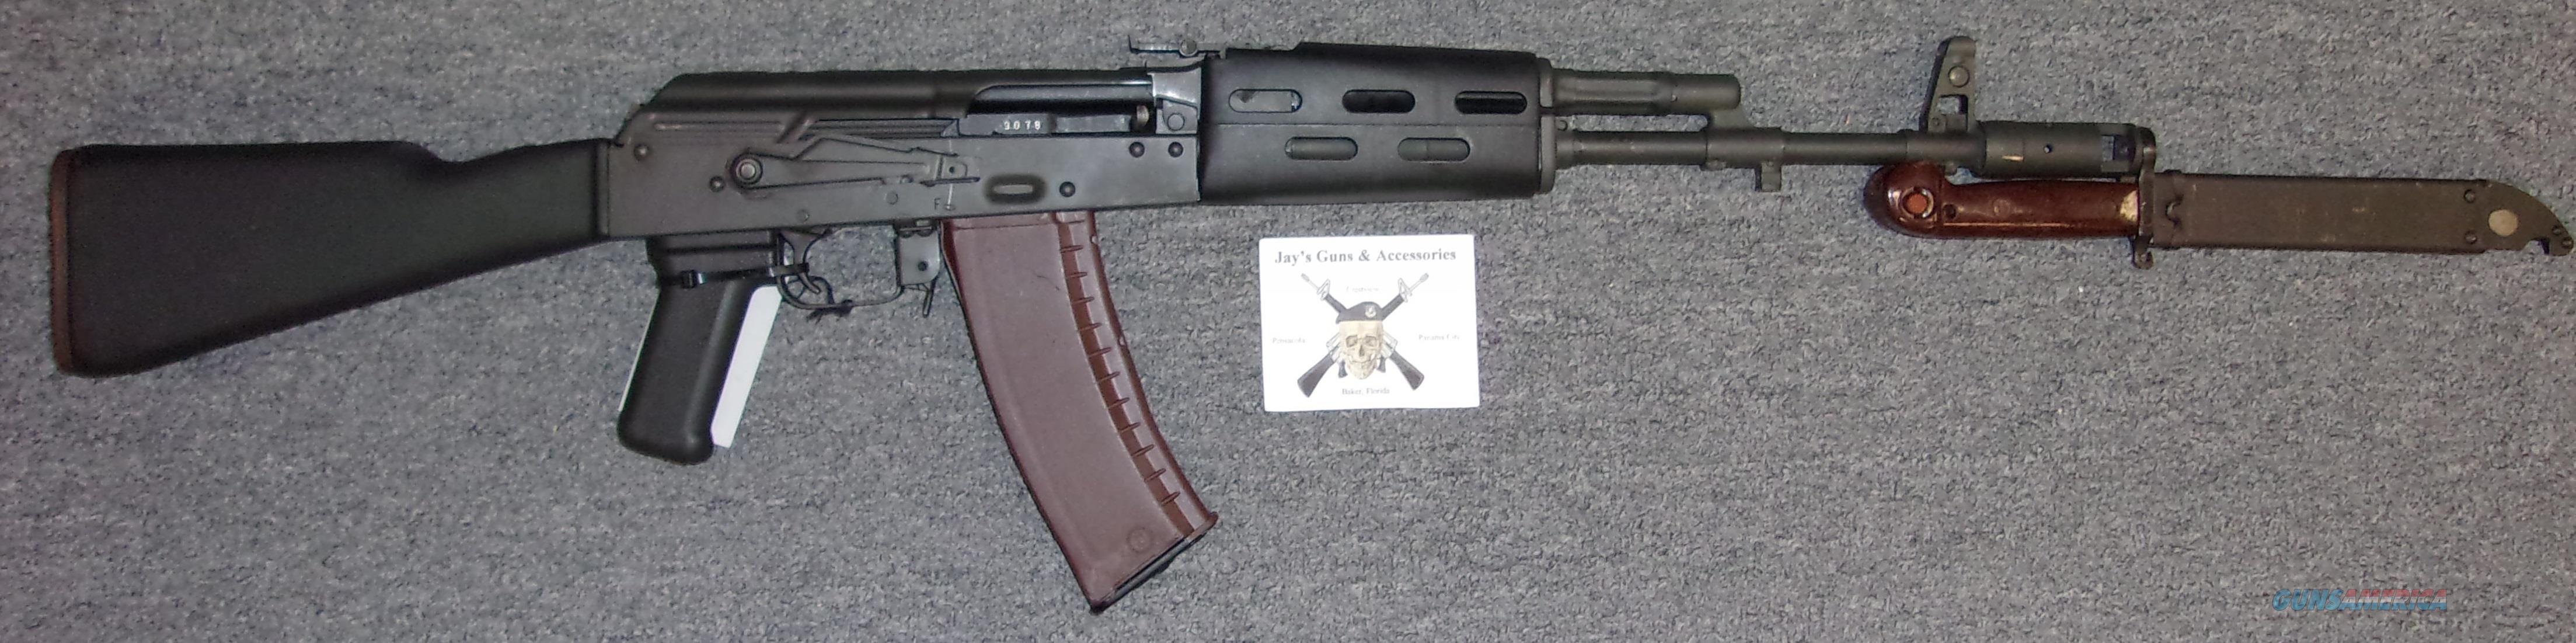 Century Arms, Inc. M74 Sporter  Guns > Rifles > Century International Arms - Rifles > Rifles